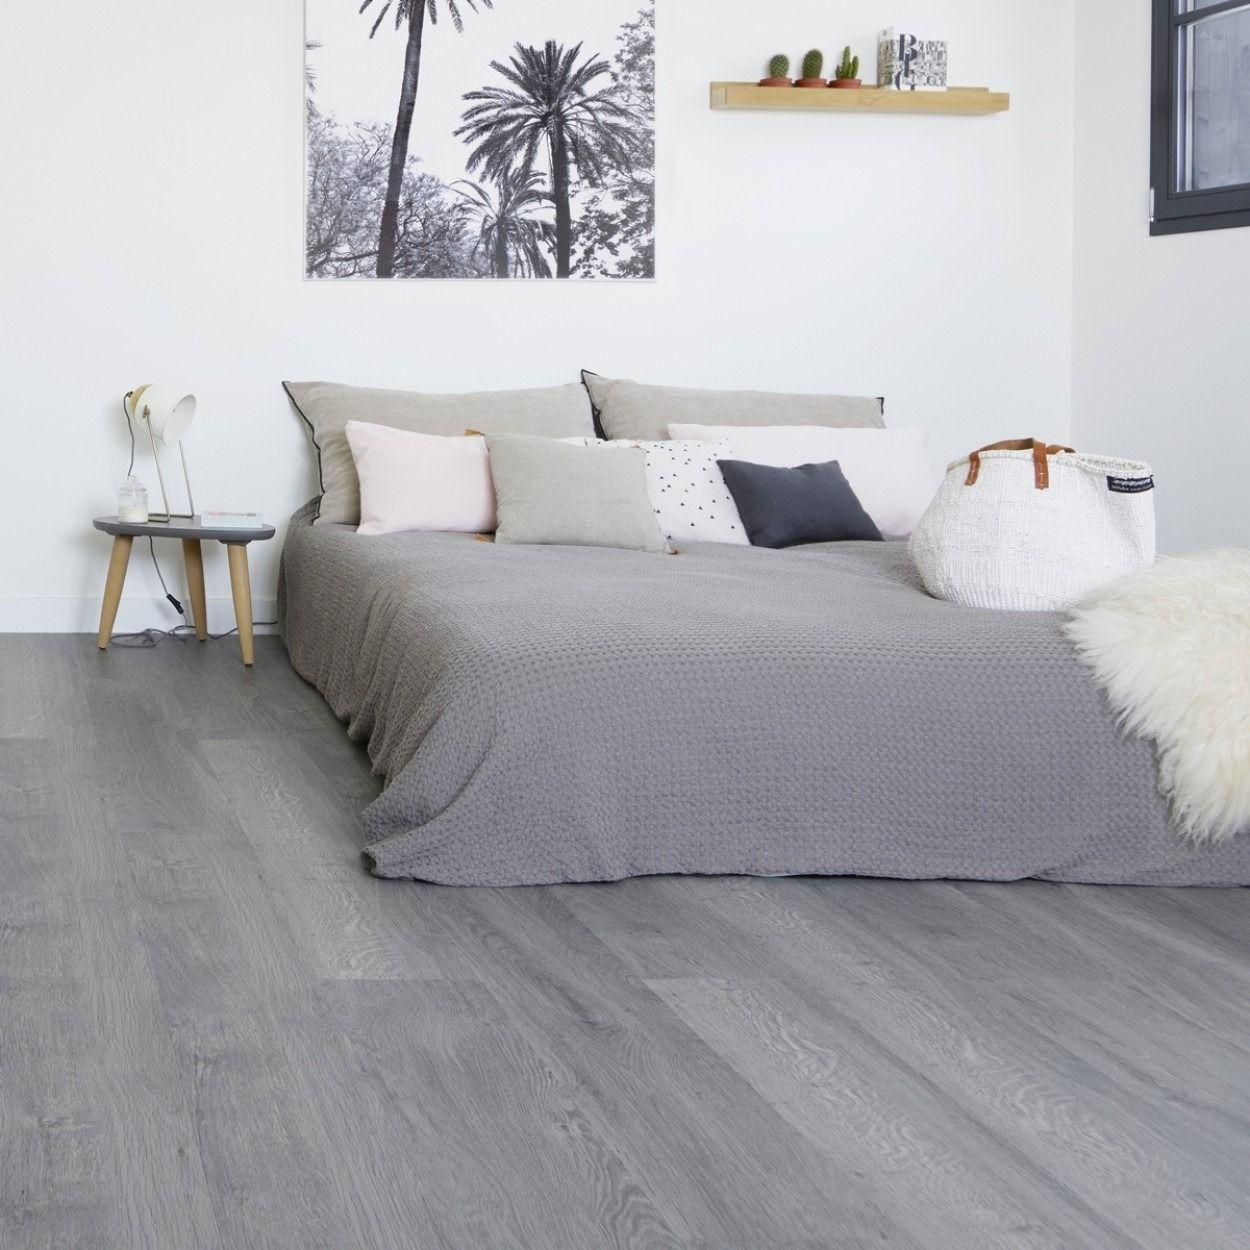 Schlafzimmer Ideen Grauer Boden